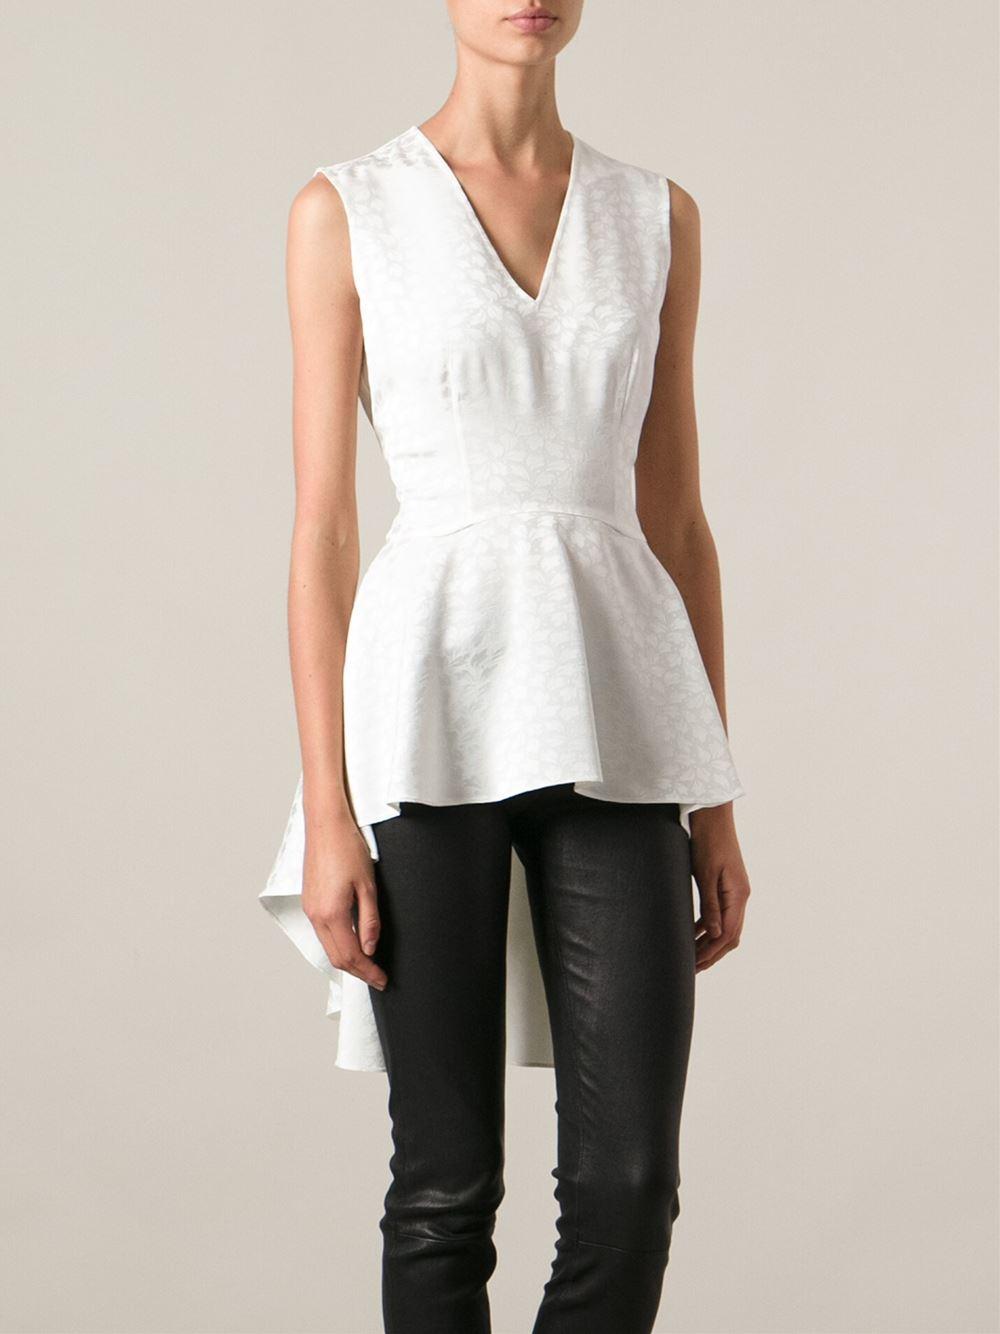 peplum blouse - White Alexander McQueen Shipping Discount Authentic cerNQ